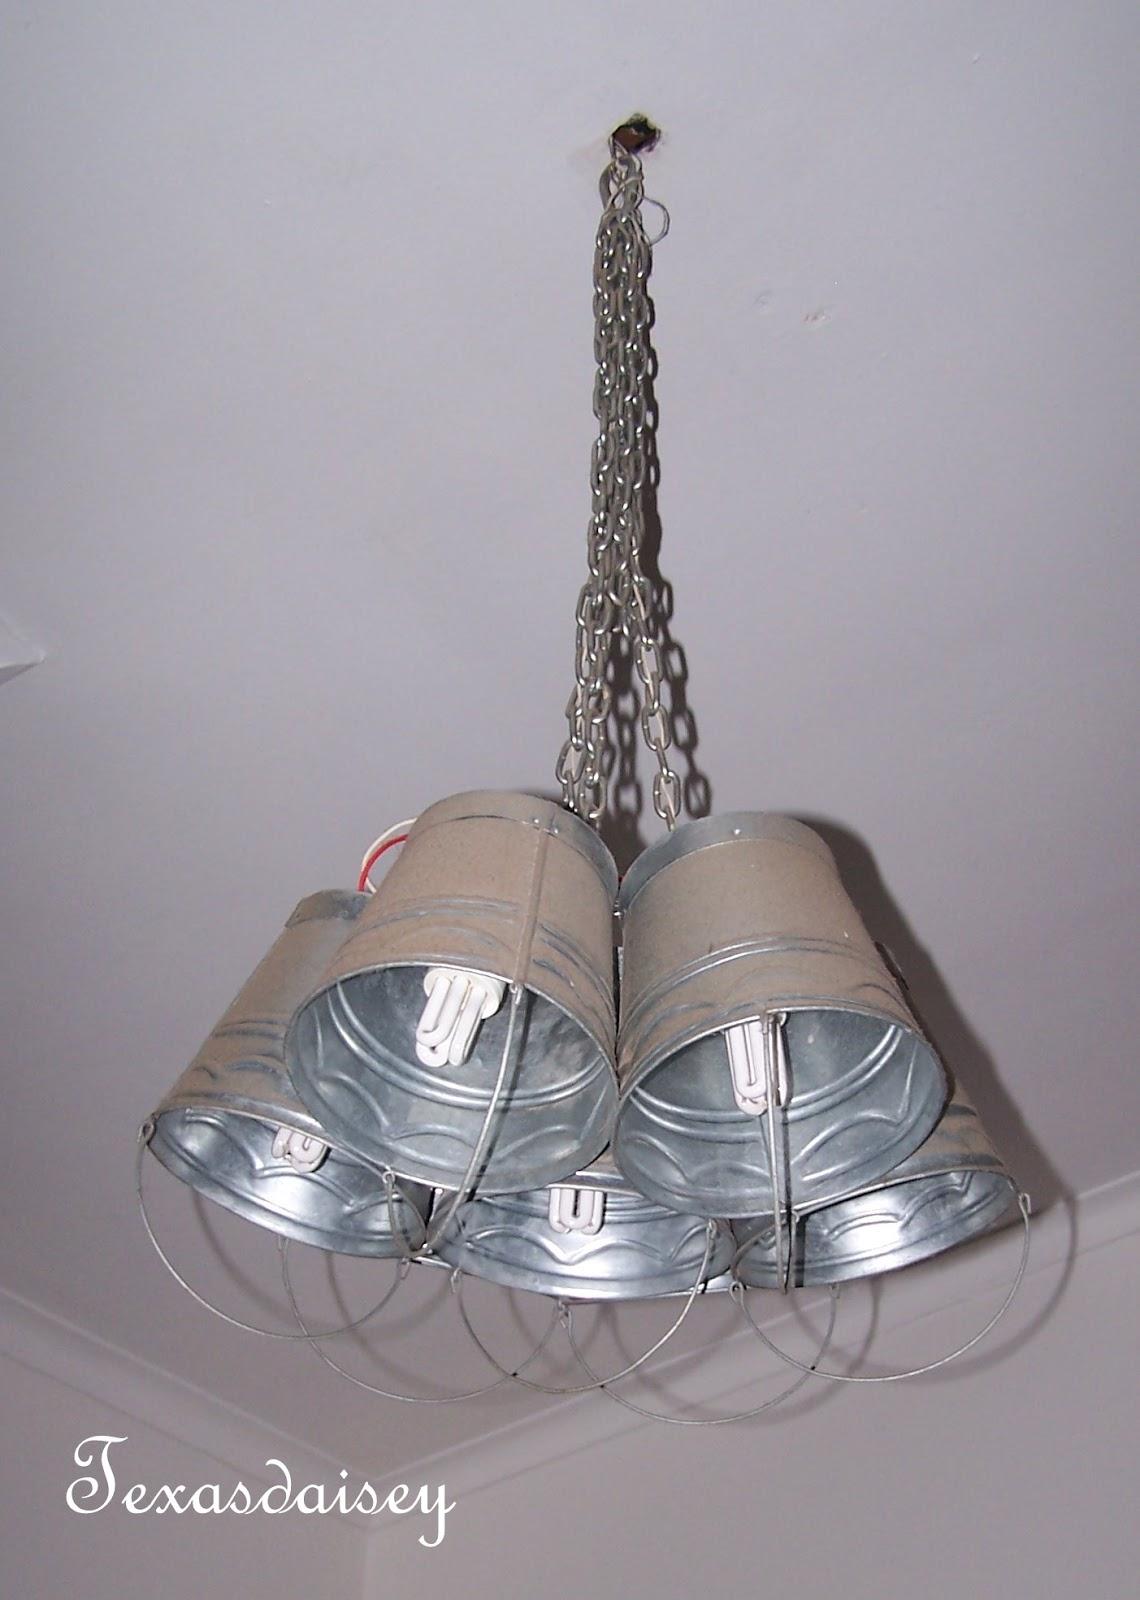 Texasdaisey creations galvanized light fixture galvanized light fixture mozeypictures Choice Image